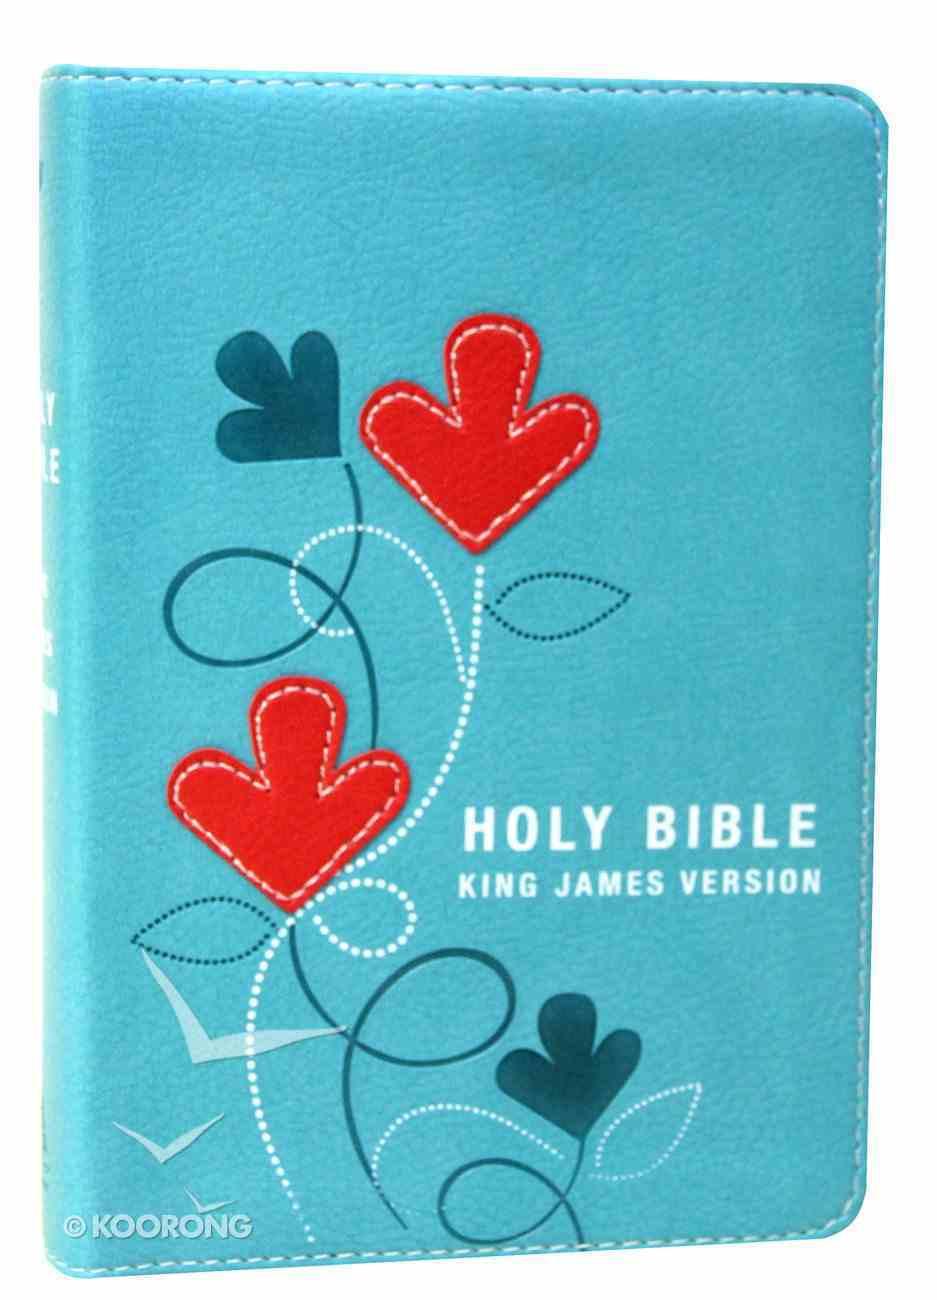 KJV Pocket Bible Turquoise Red Letter Edition Imitation Leather